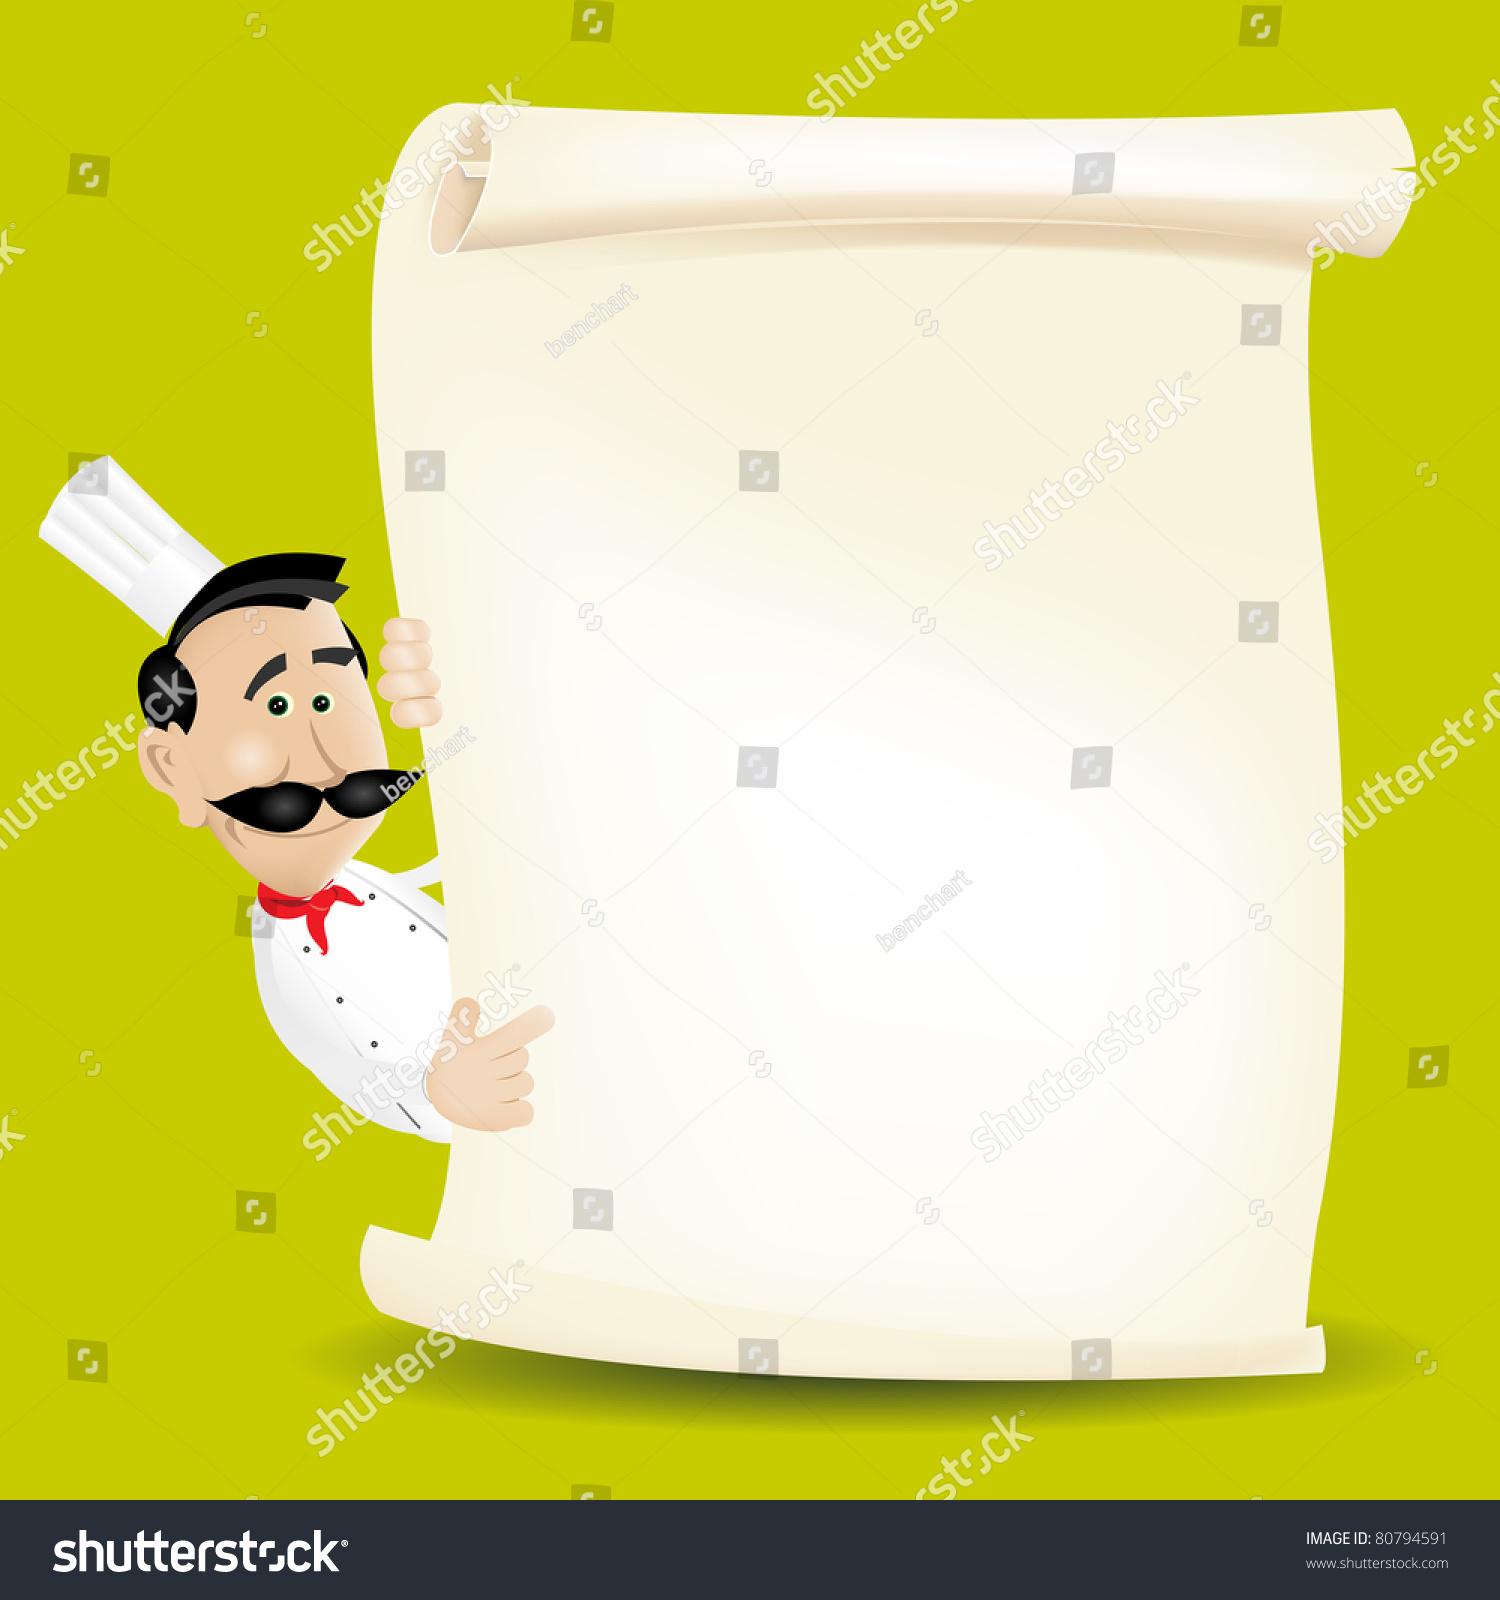 chef cook restaurant menu illustration chef stock illustration